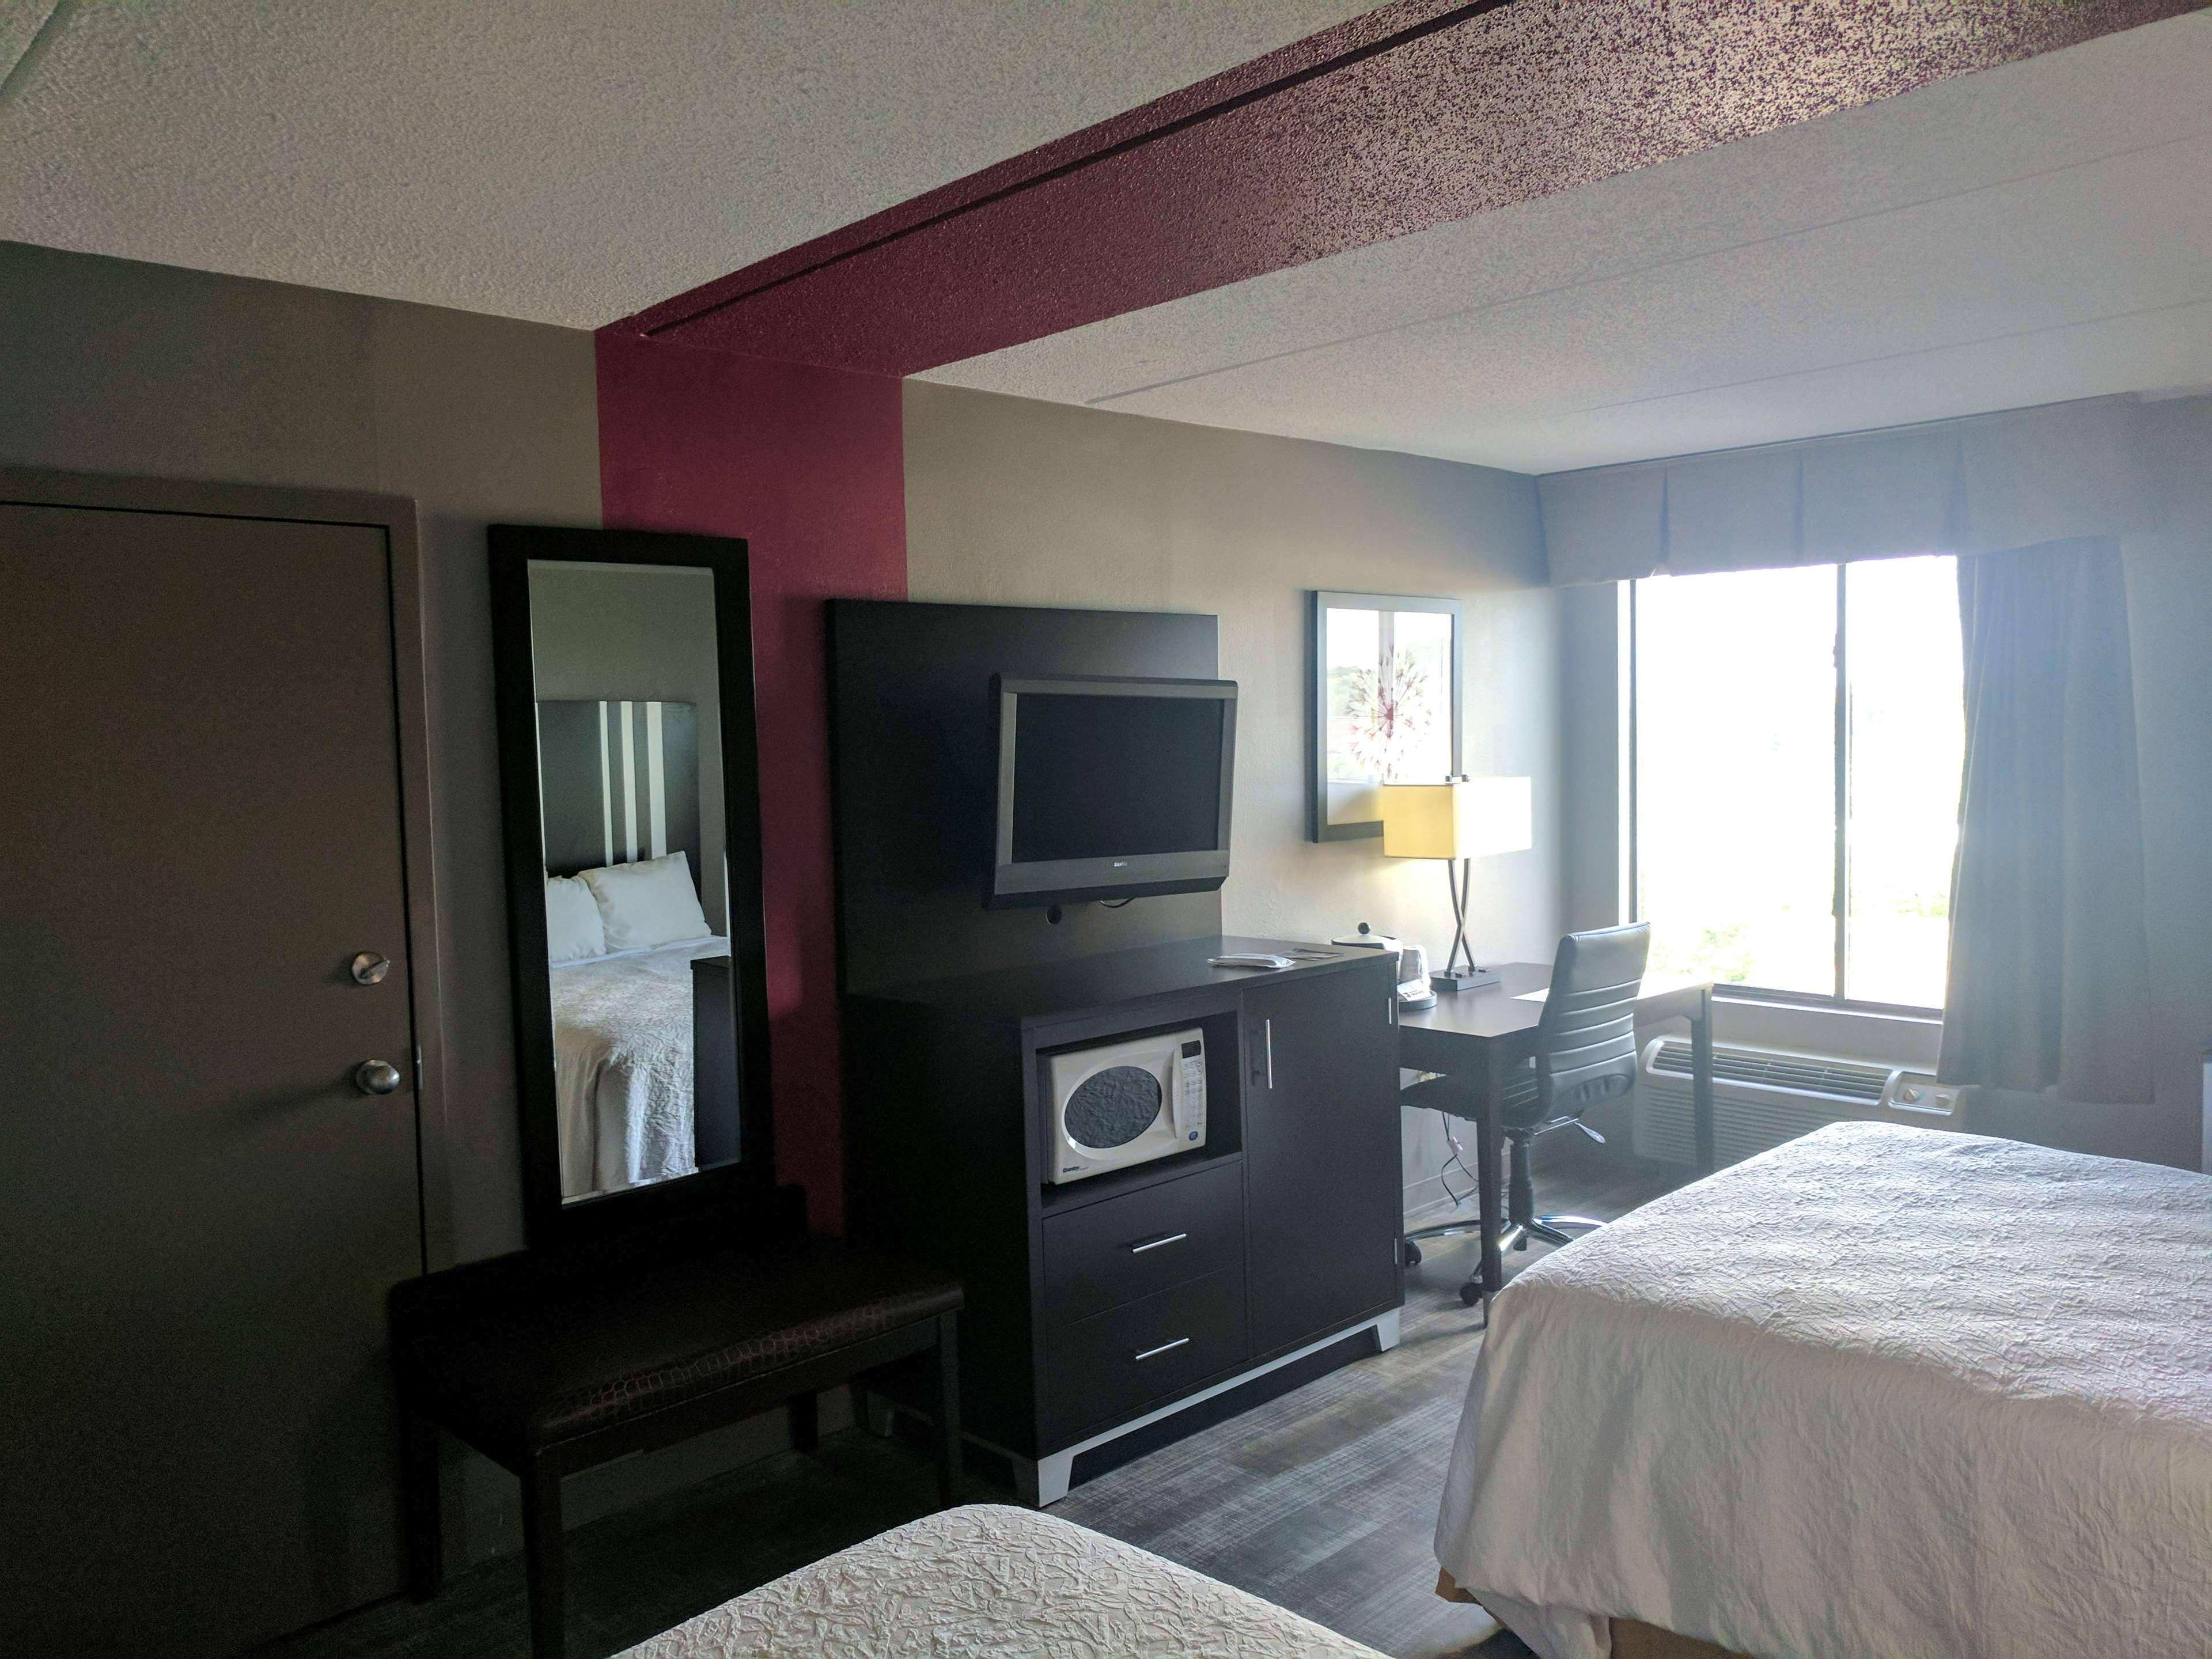 Best Western Plus Greensboro Airport Hotel image 13